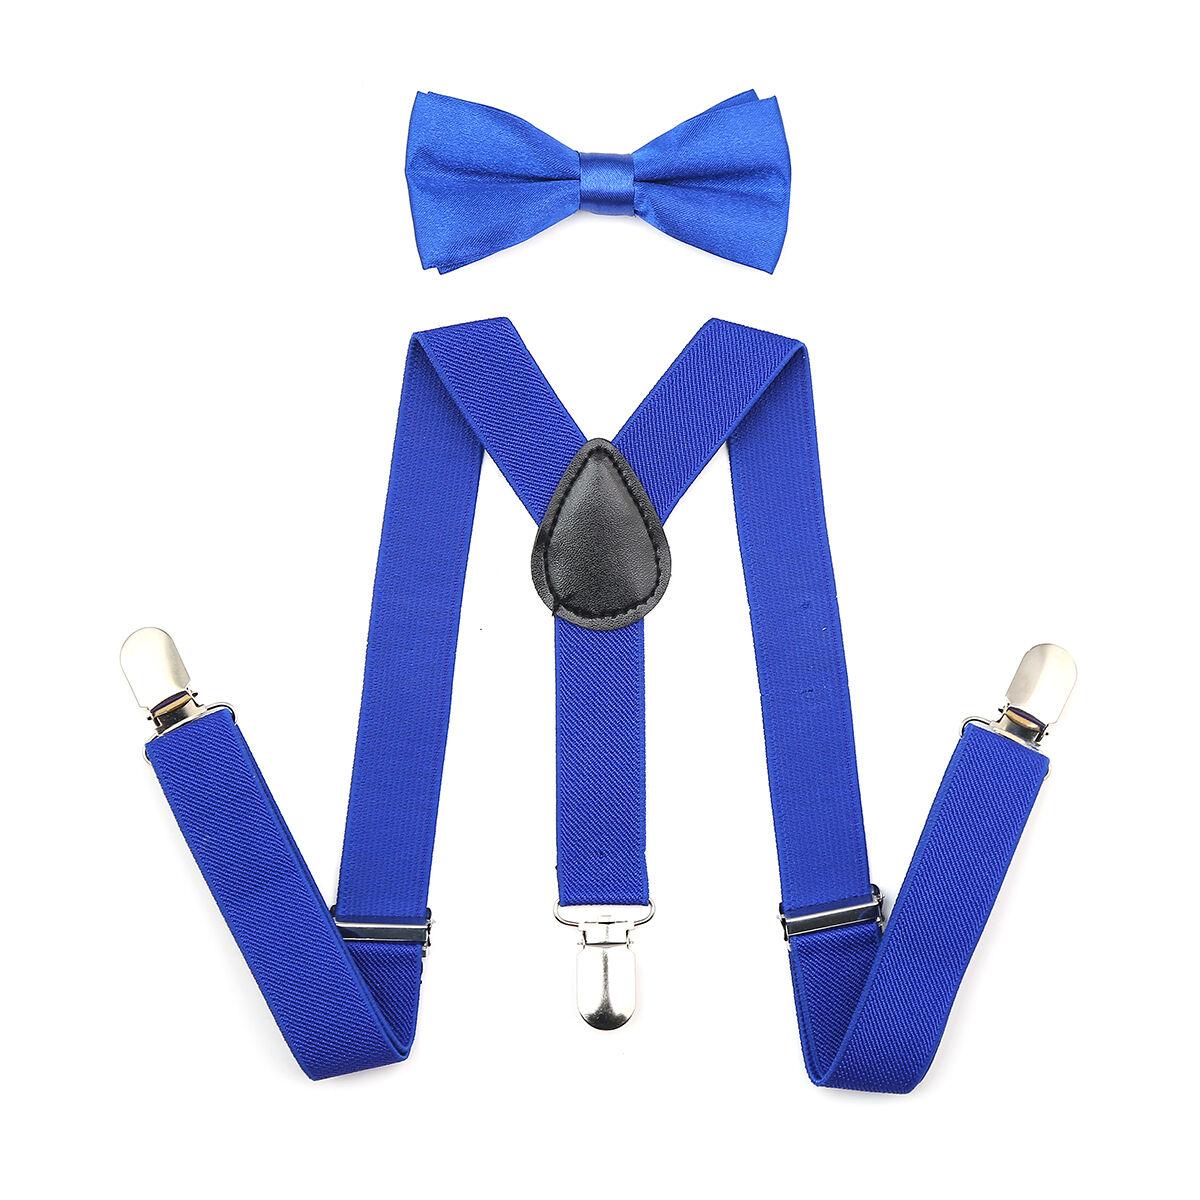 Adjustable Suspender and Bow Tie Set for Baby Toddler Kids Boys Girls Children 3